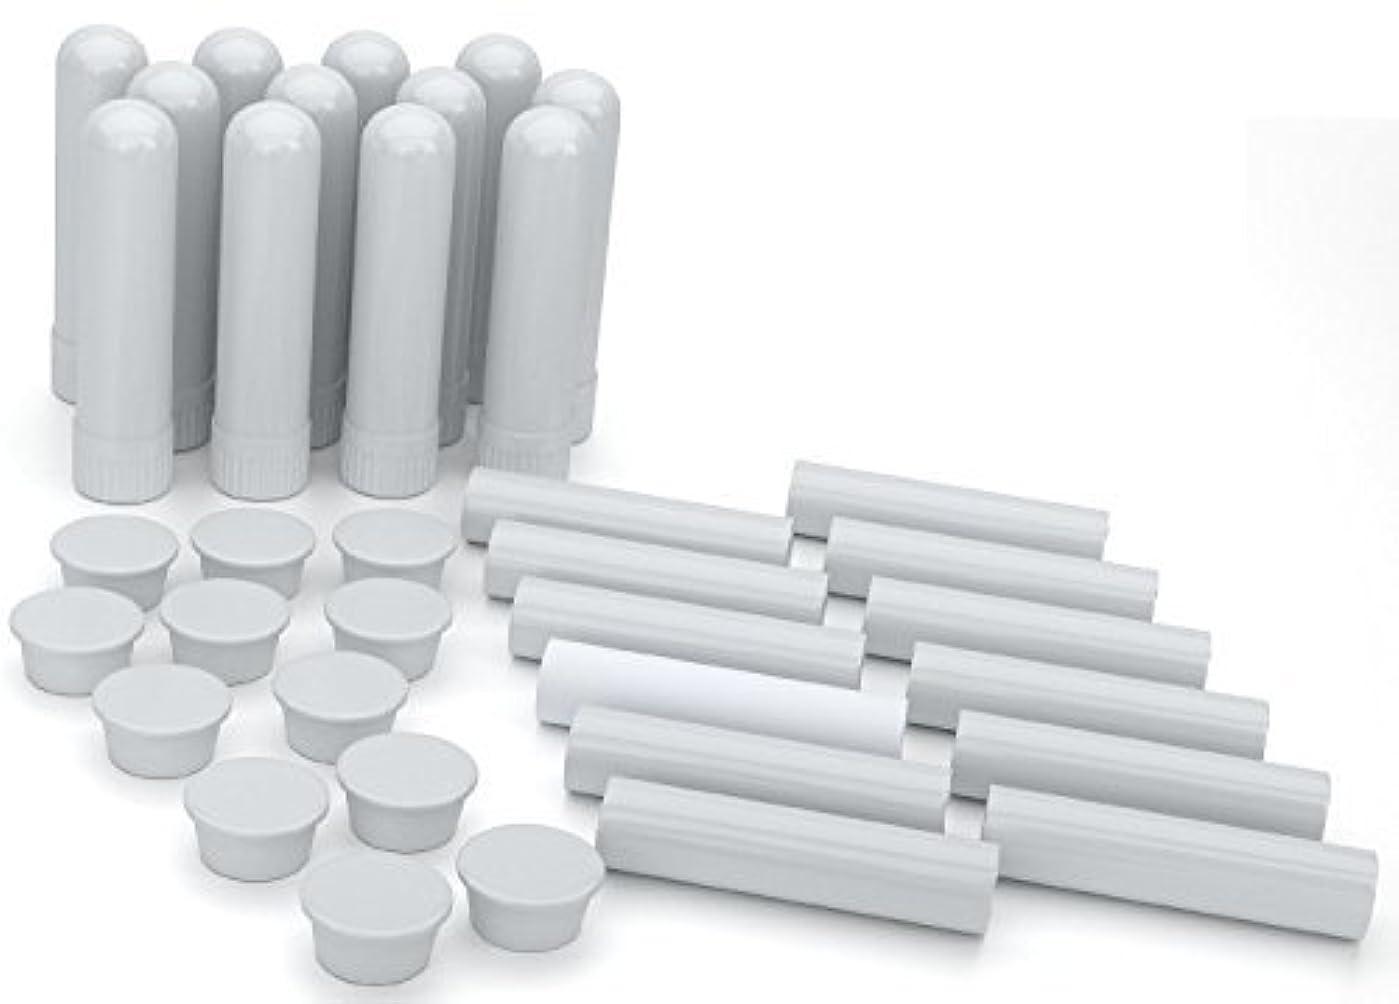 描写戦闘公Essential Oil Aromatherapy Blank Nasal Inhaler Tubes (12 Complete Sticks), Empty White Vapor Inhalers w/Wicks...